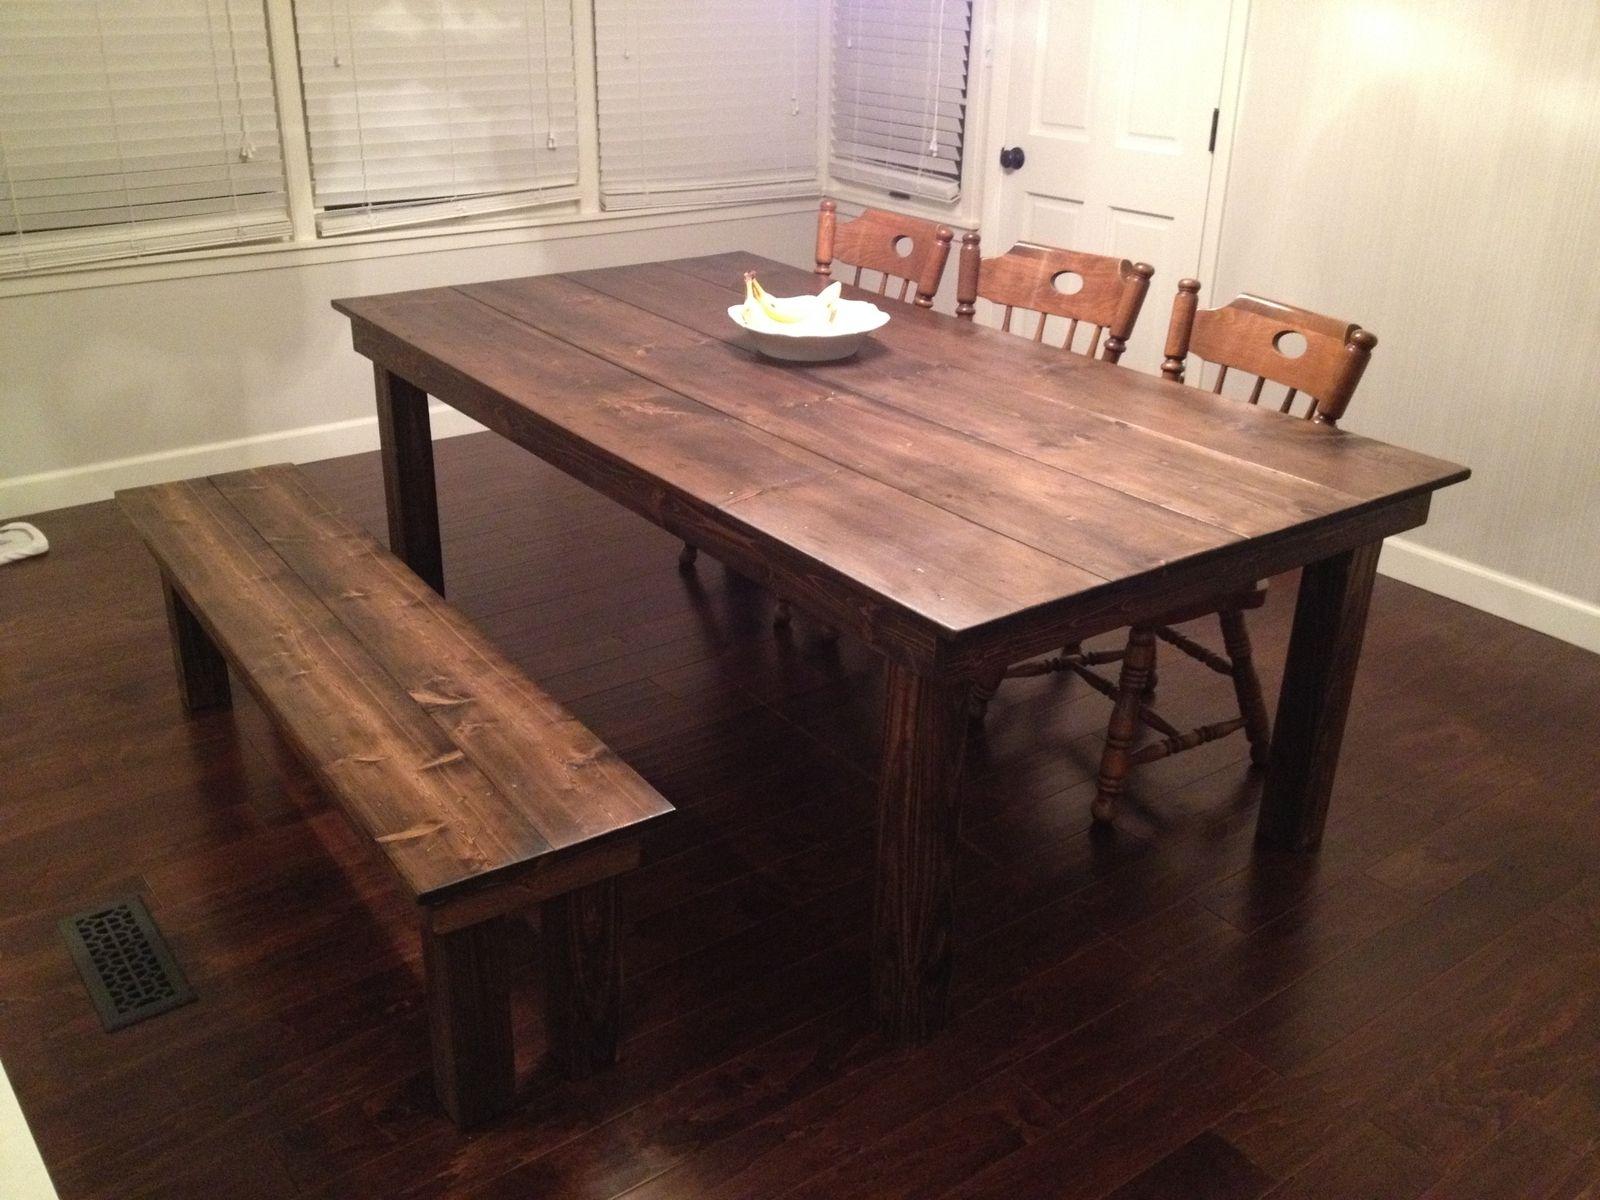 Custom Farmhouse Dining Table by Gypsum Valley Made